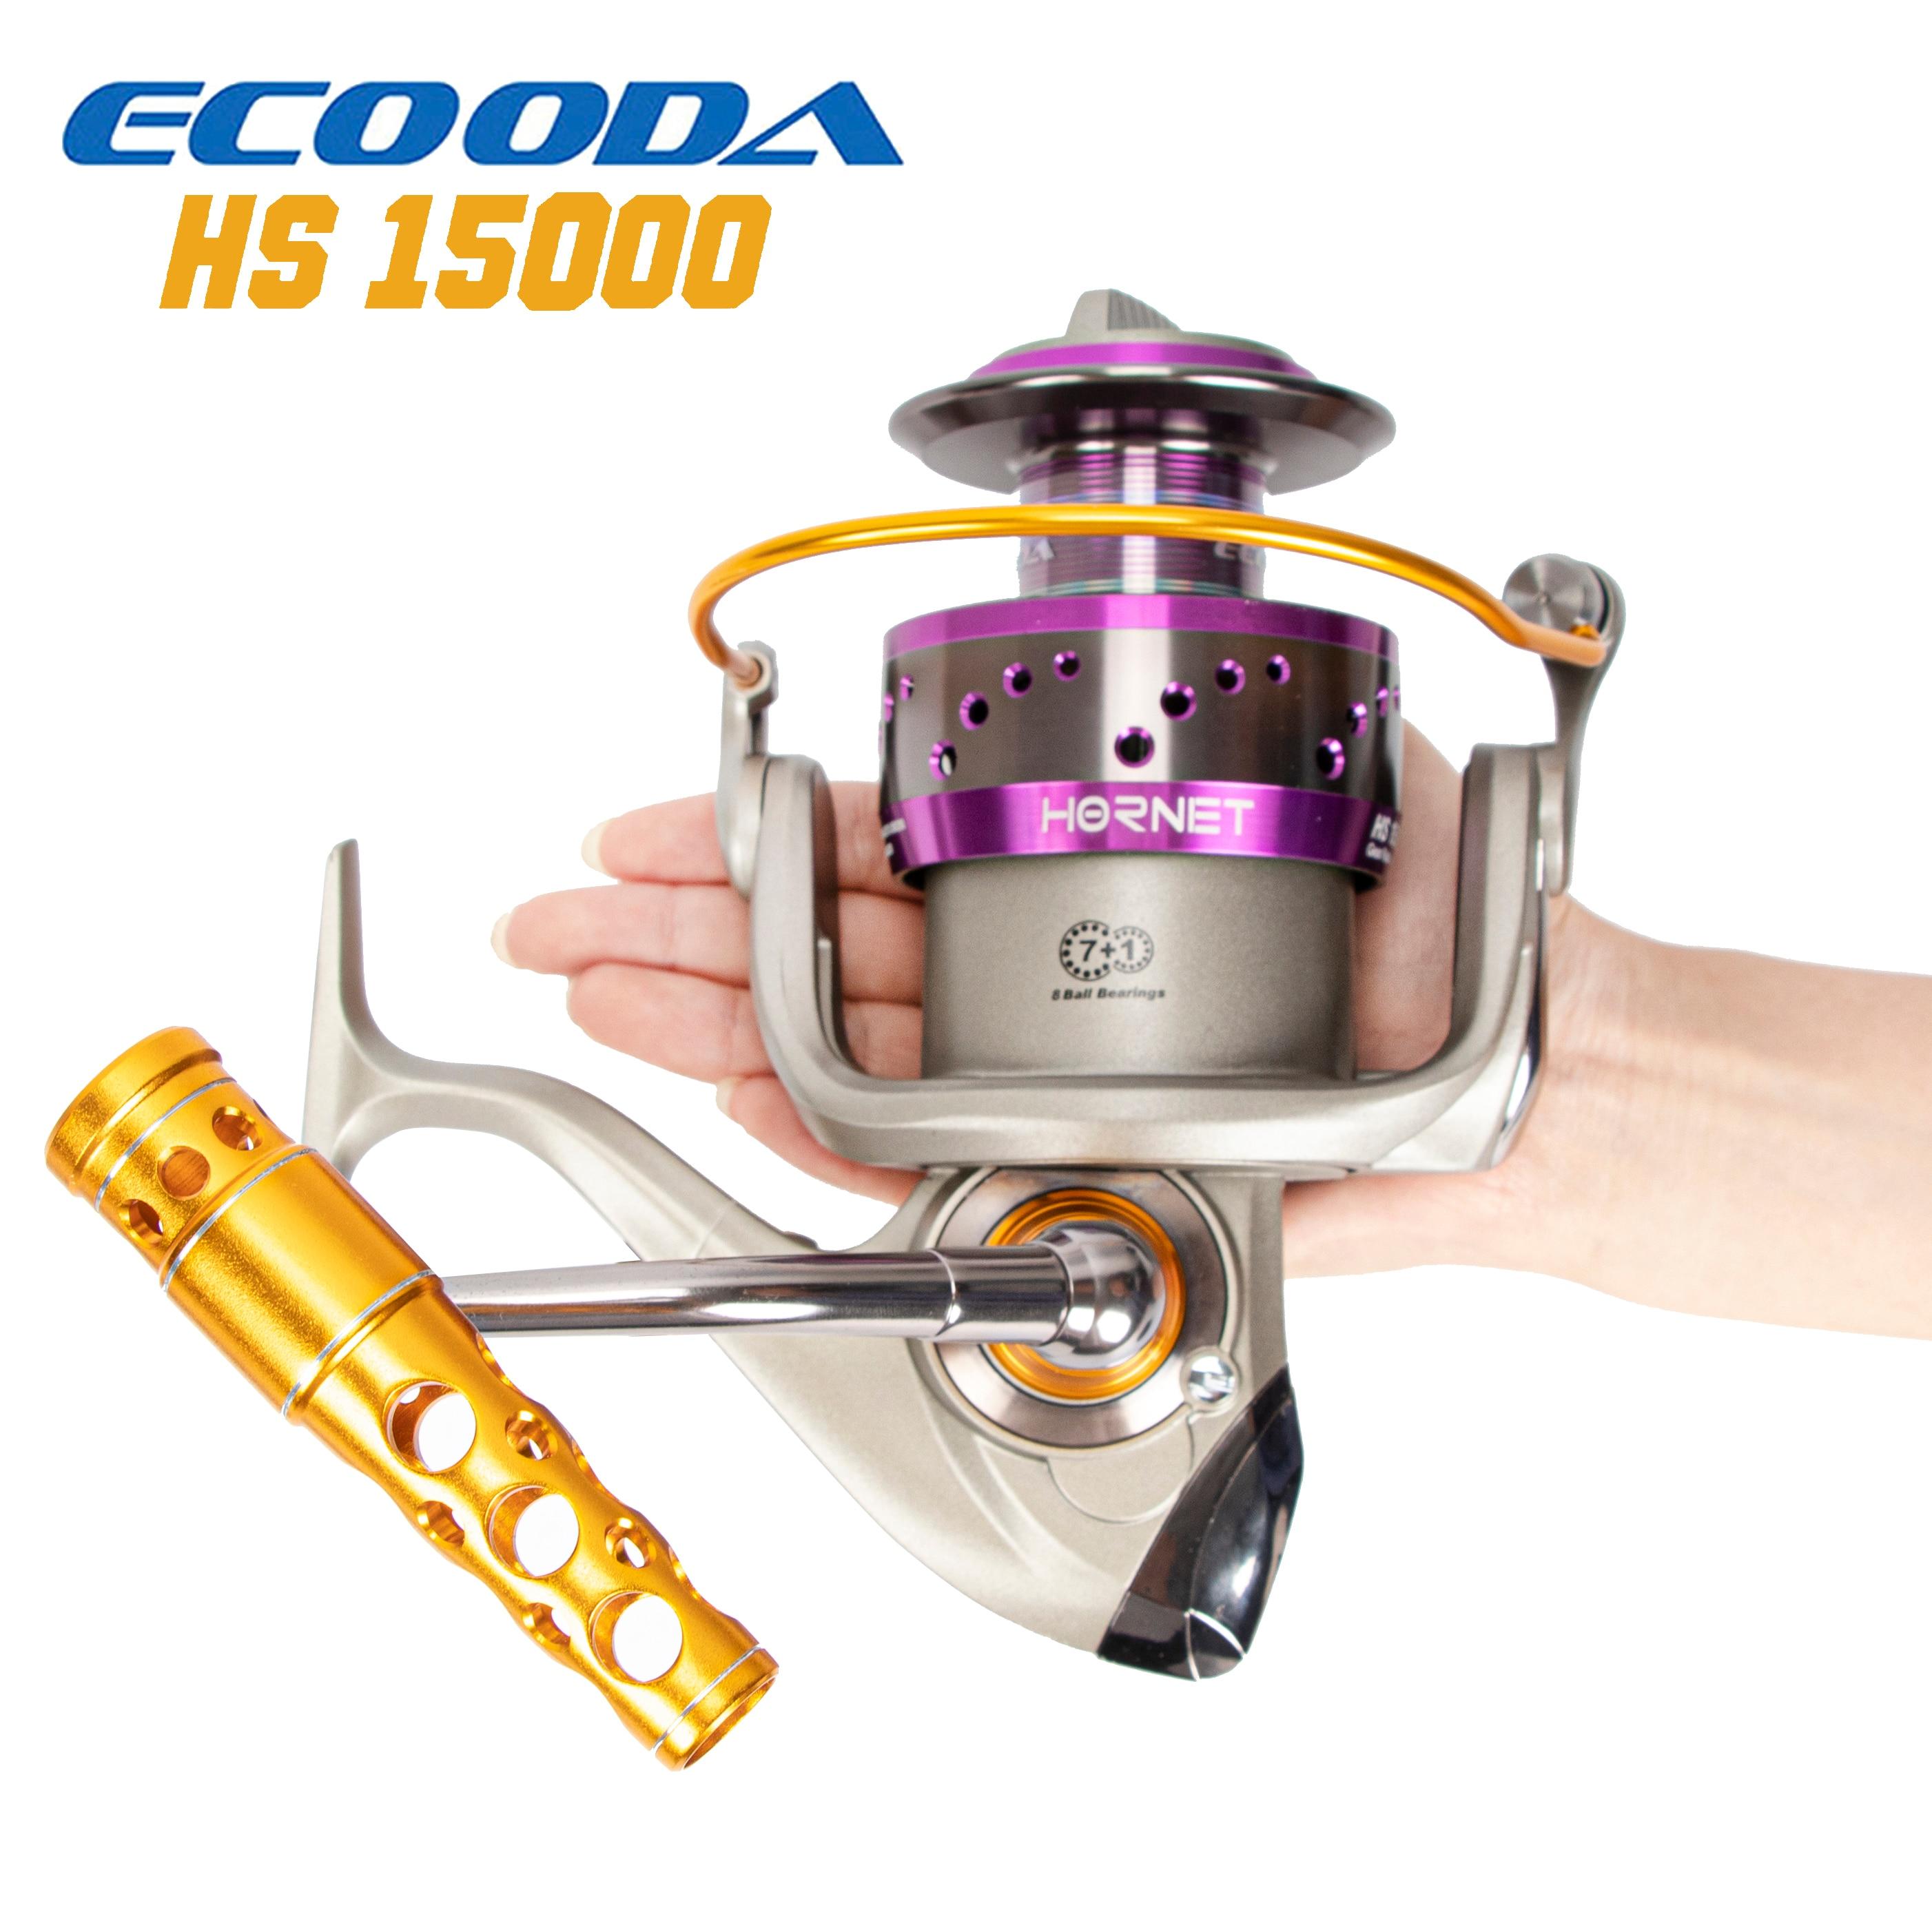 ECOODA 2019 新ホーネット 15000 ヘビーデューティ金属スピニング釣りリール塩水ボートロックトローリングジギングリール  グループ上の スポーツ & エンターテイメント からの 釣りリール の中 1